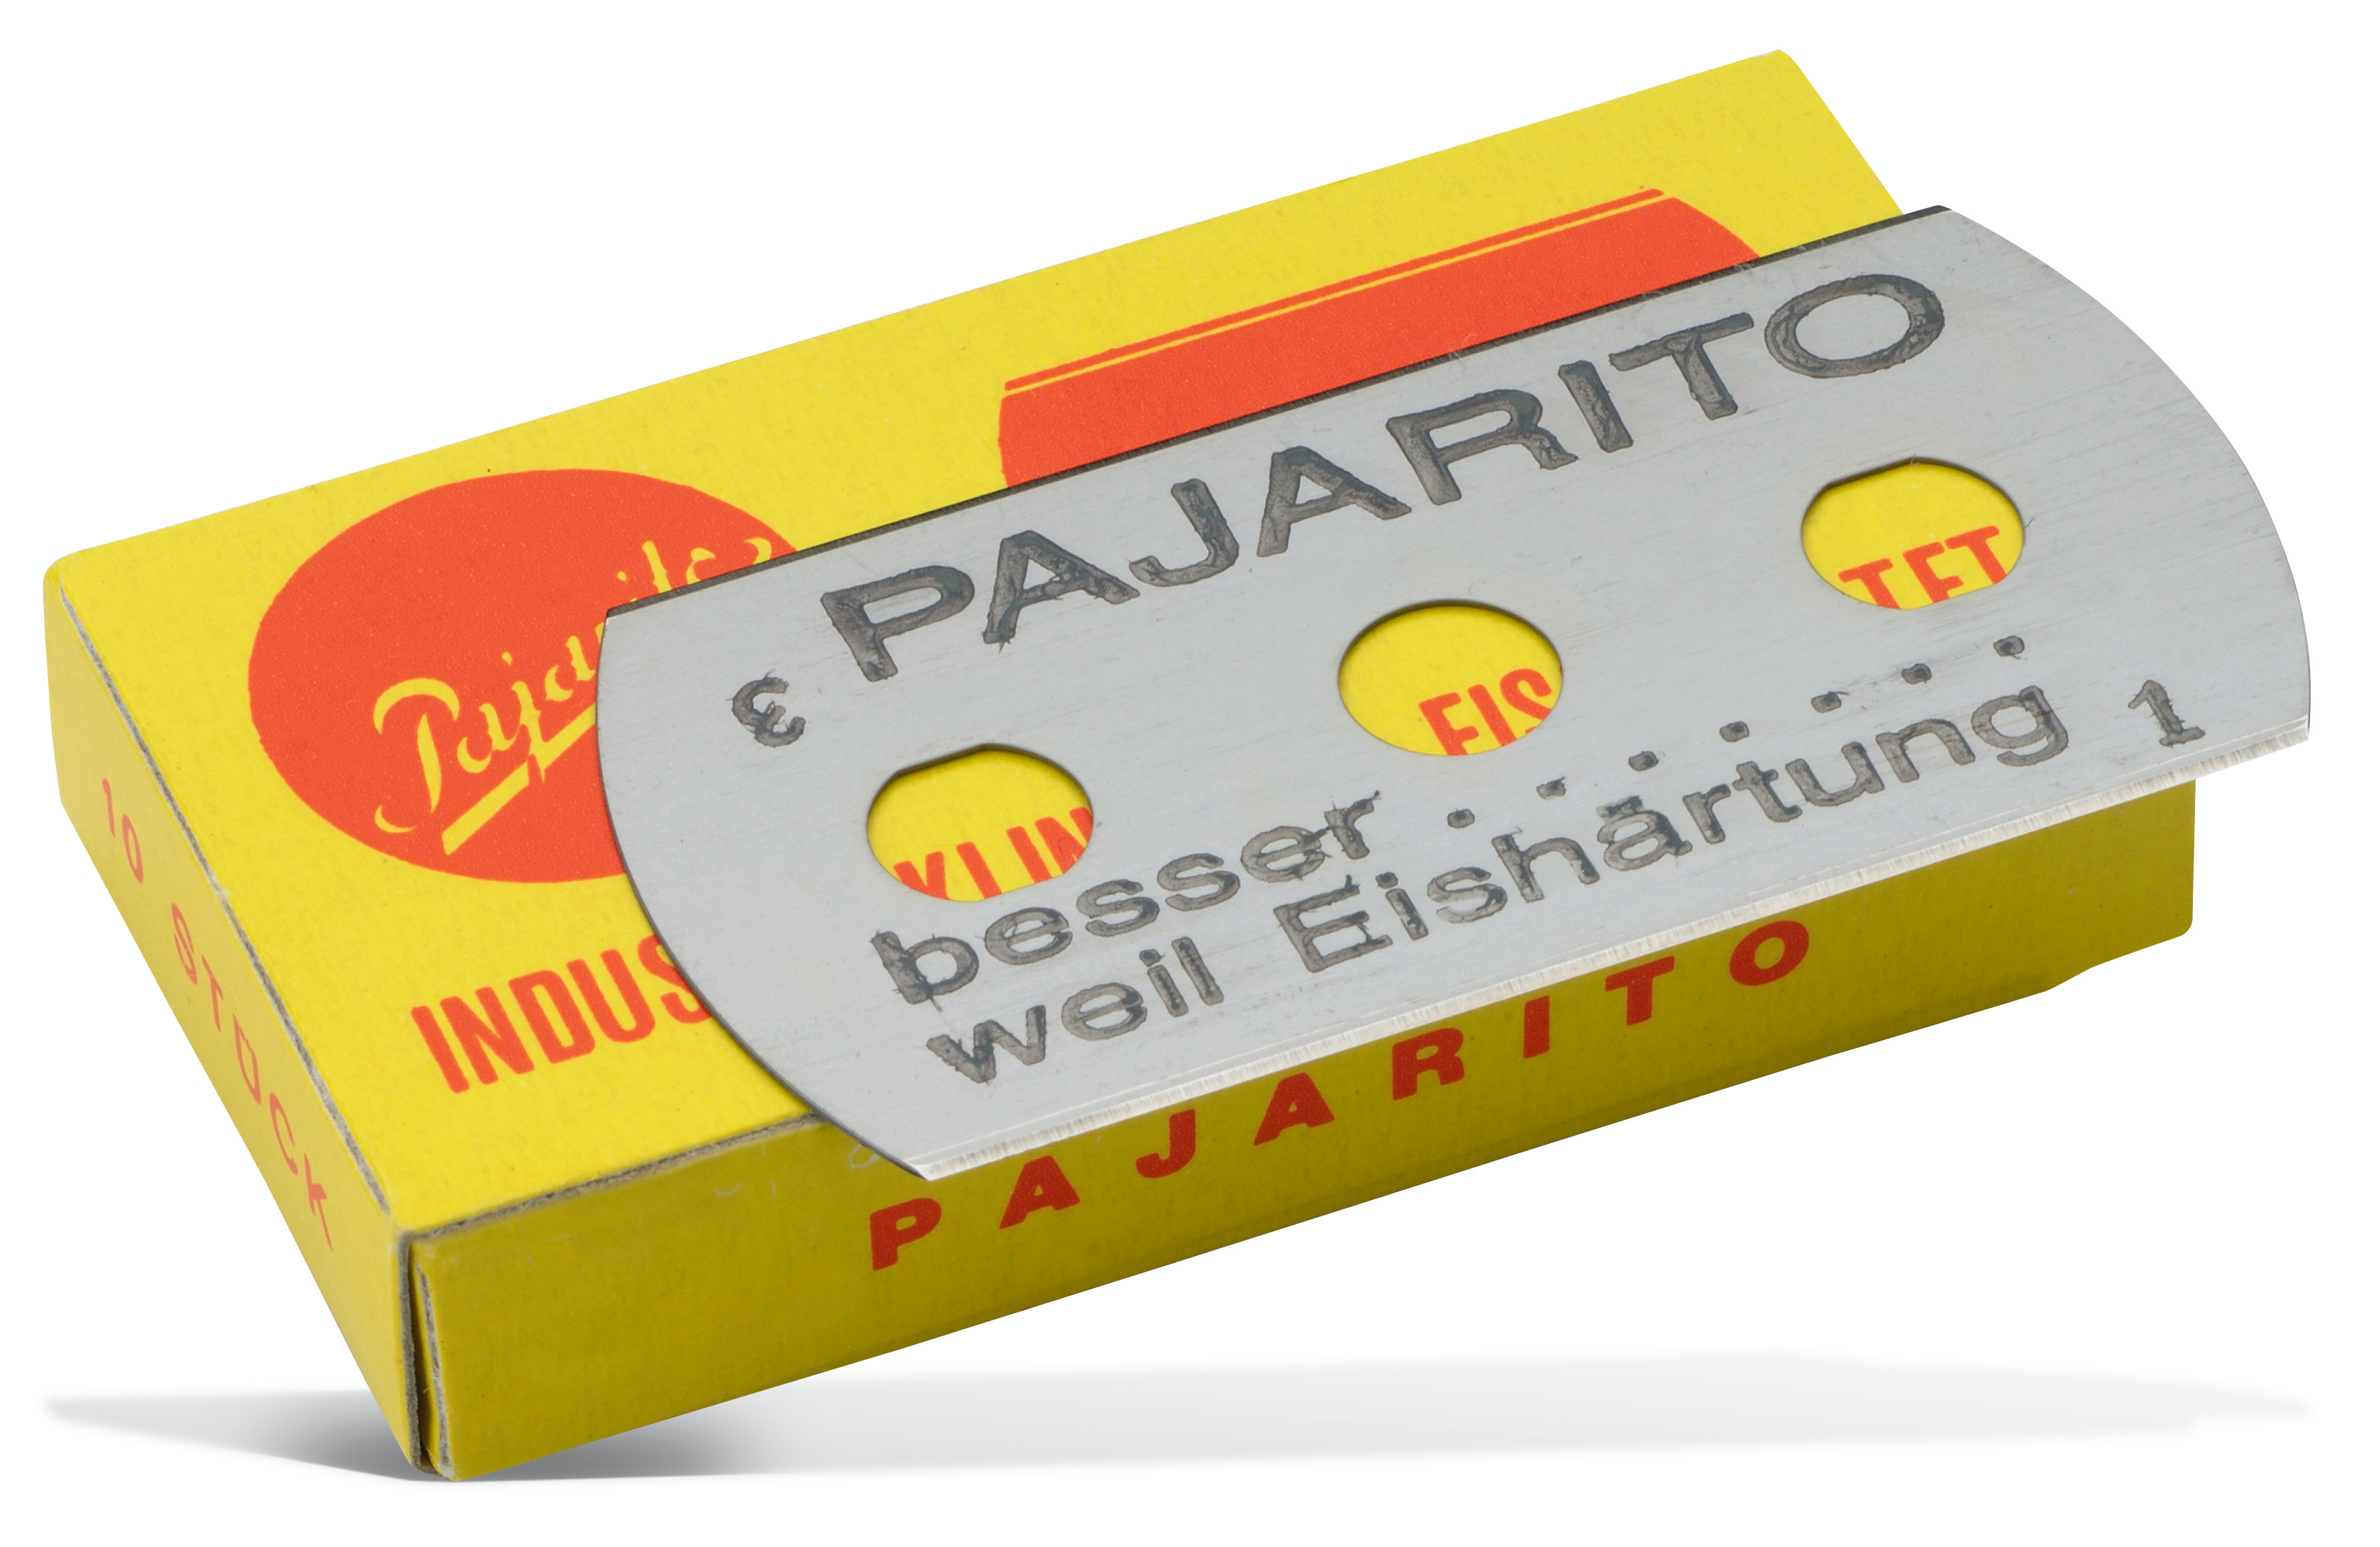 3-Loch-Industrieklinge (ohne Abb.) Pajarito 10 Stück